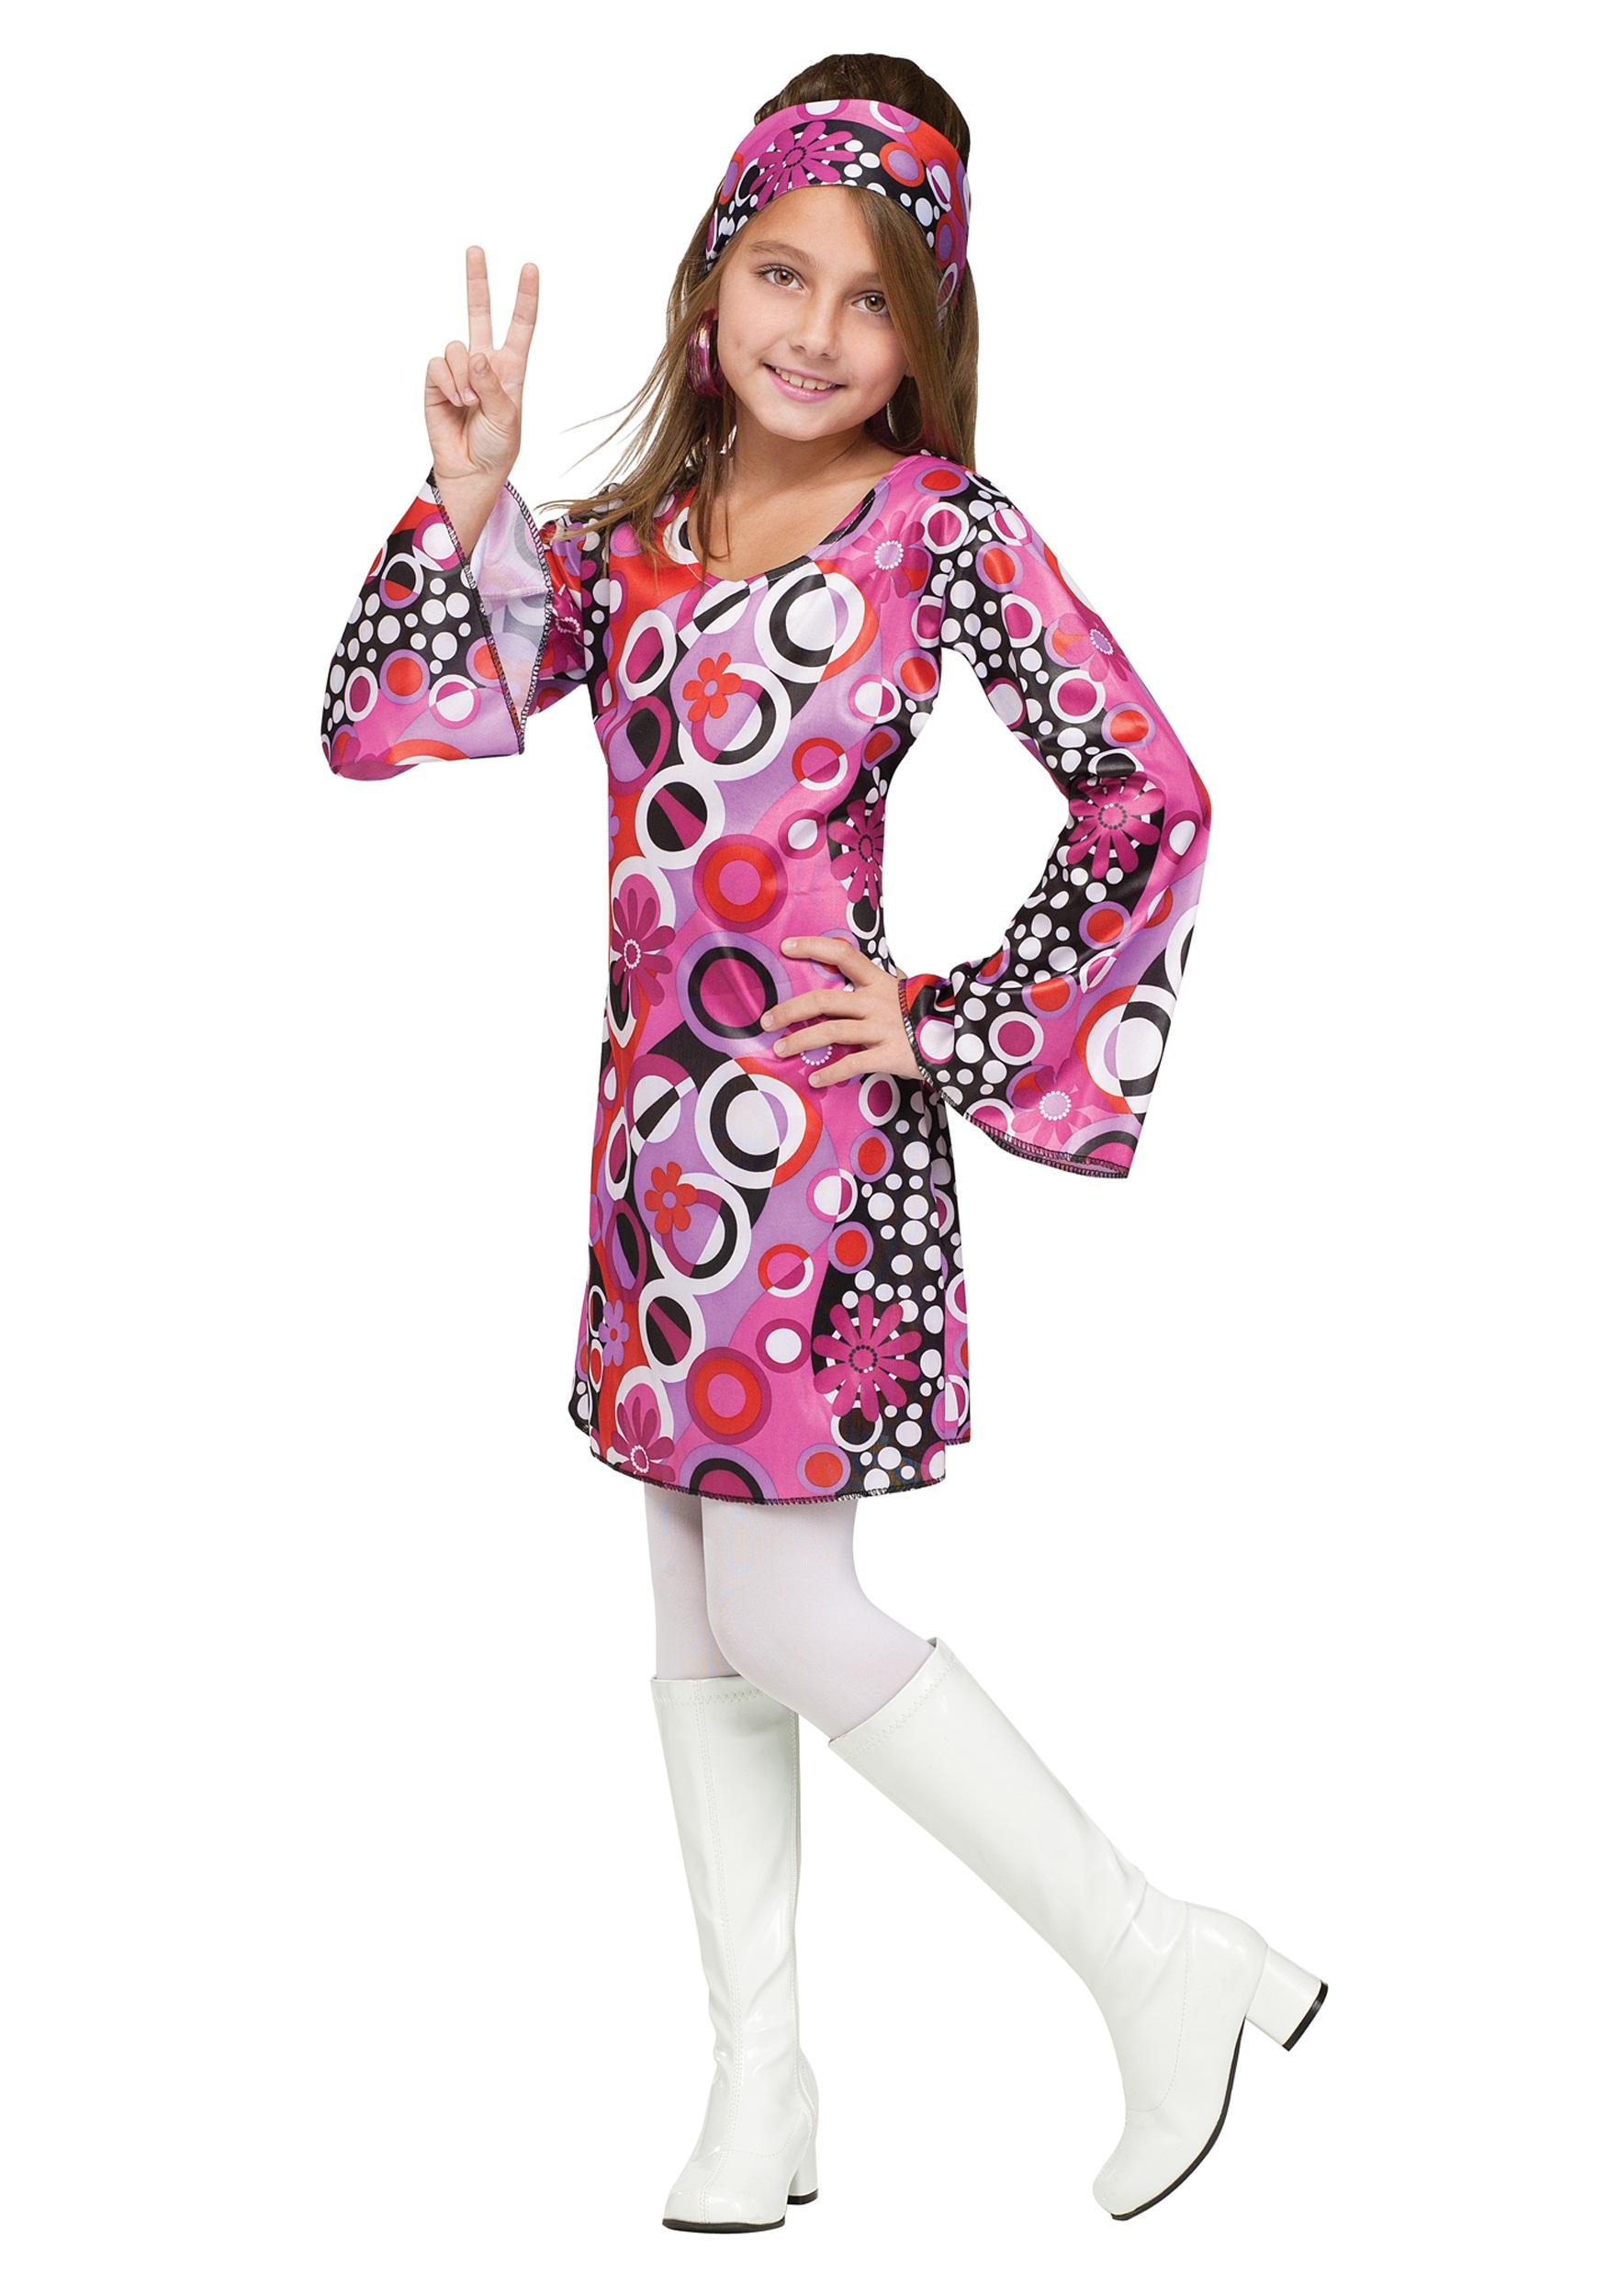 Child Feelinu0027 Groovy Costume  sc 1 st  Halloween Costumes & Child Feelinu0027 Groovy Costume - Halloween Costumes